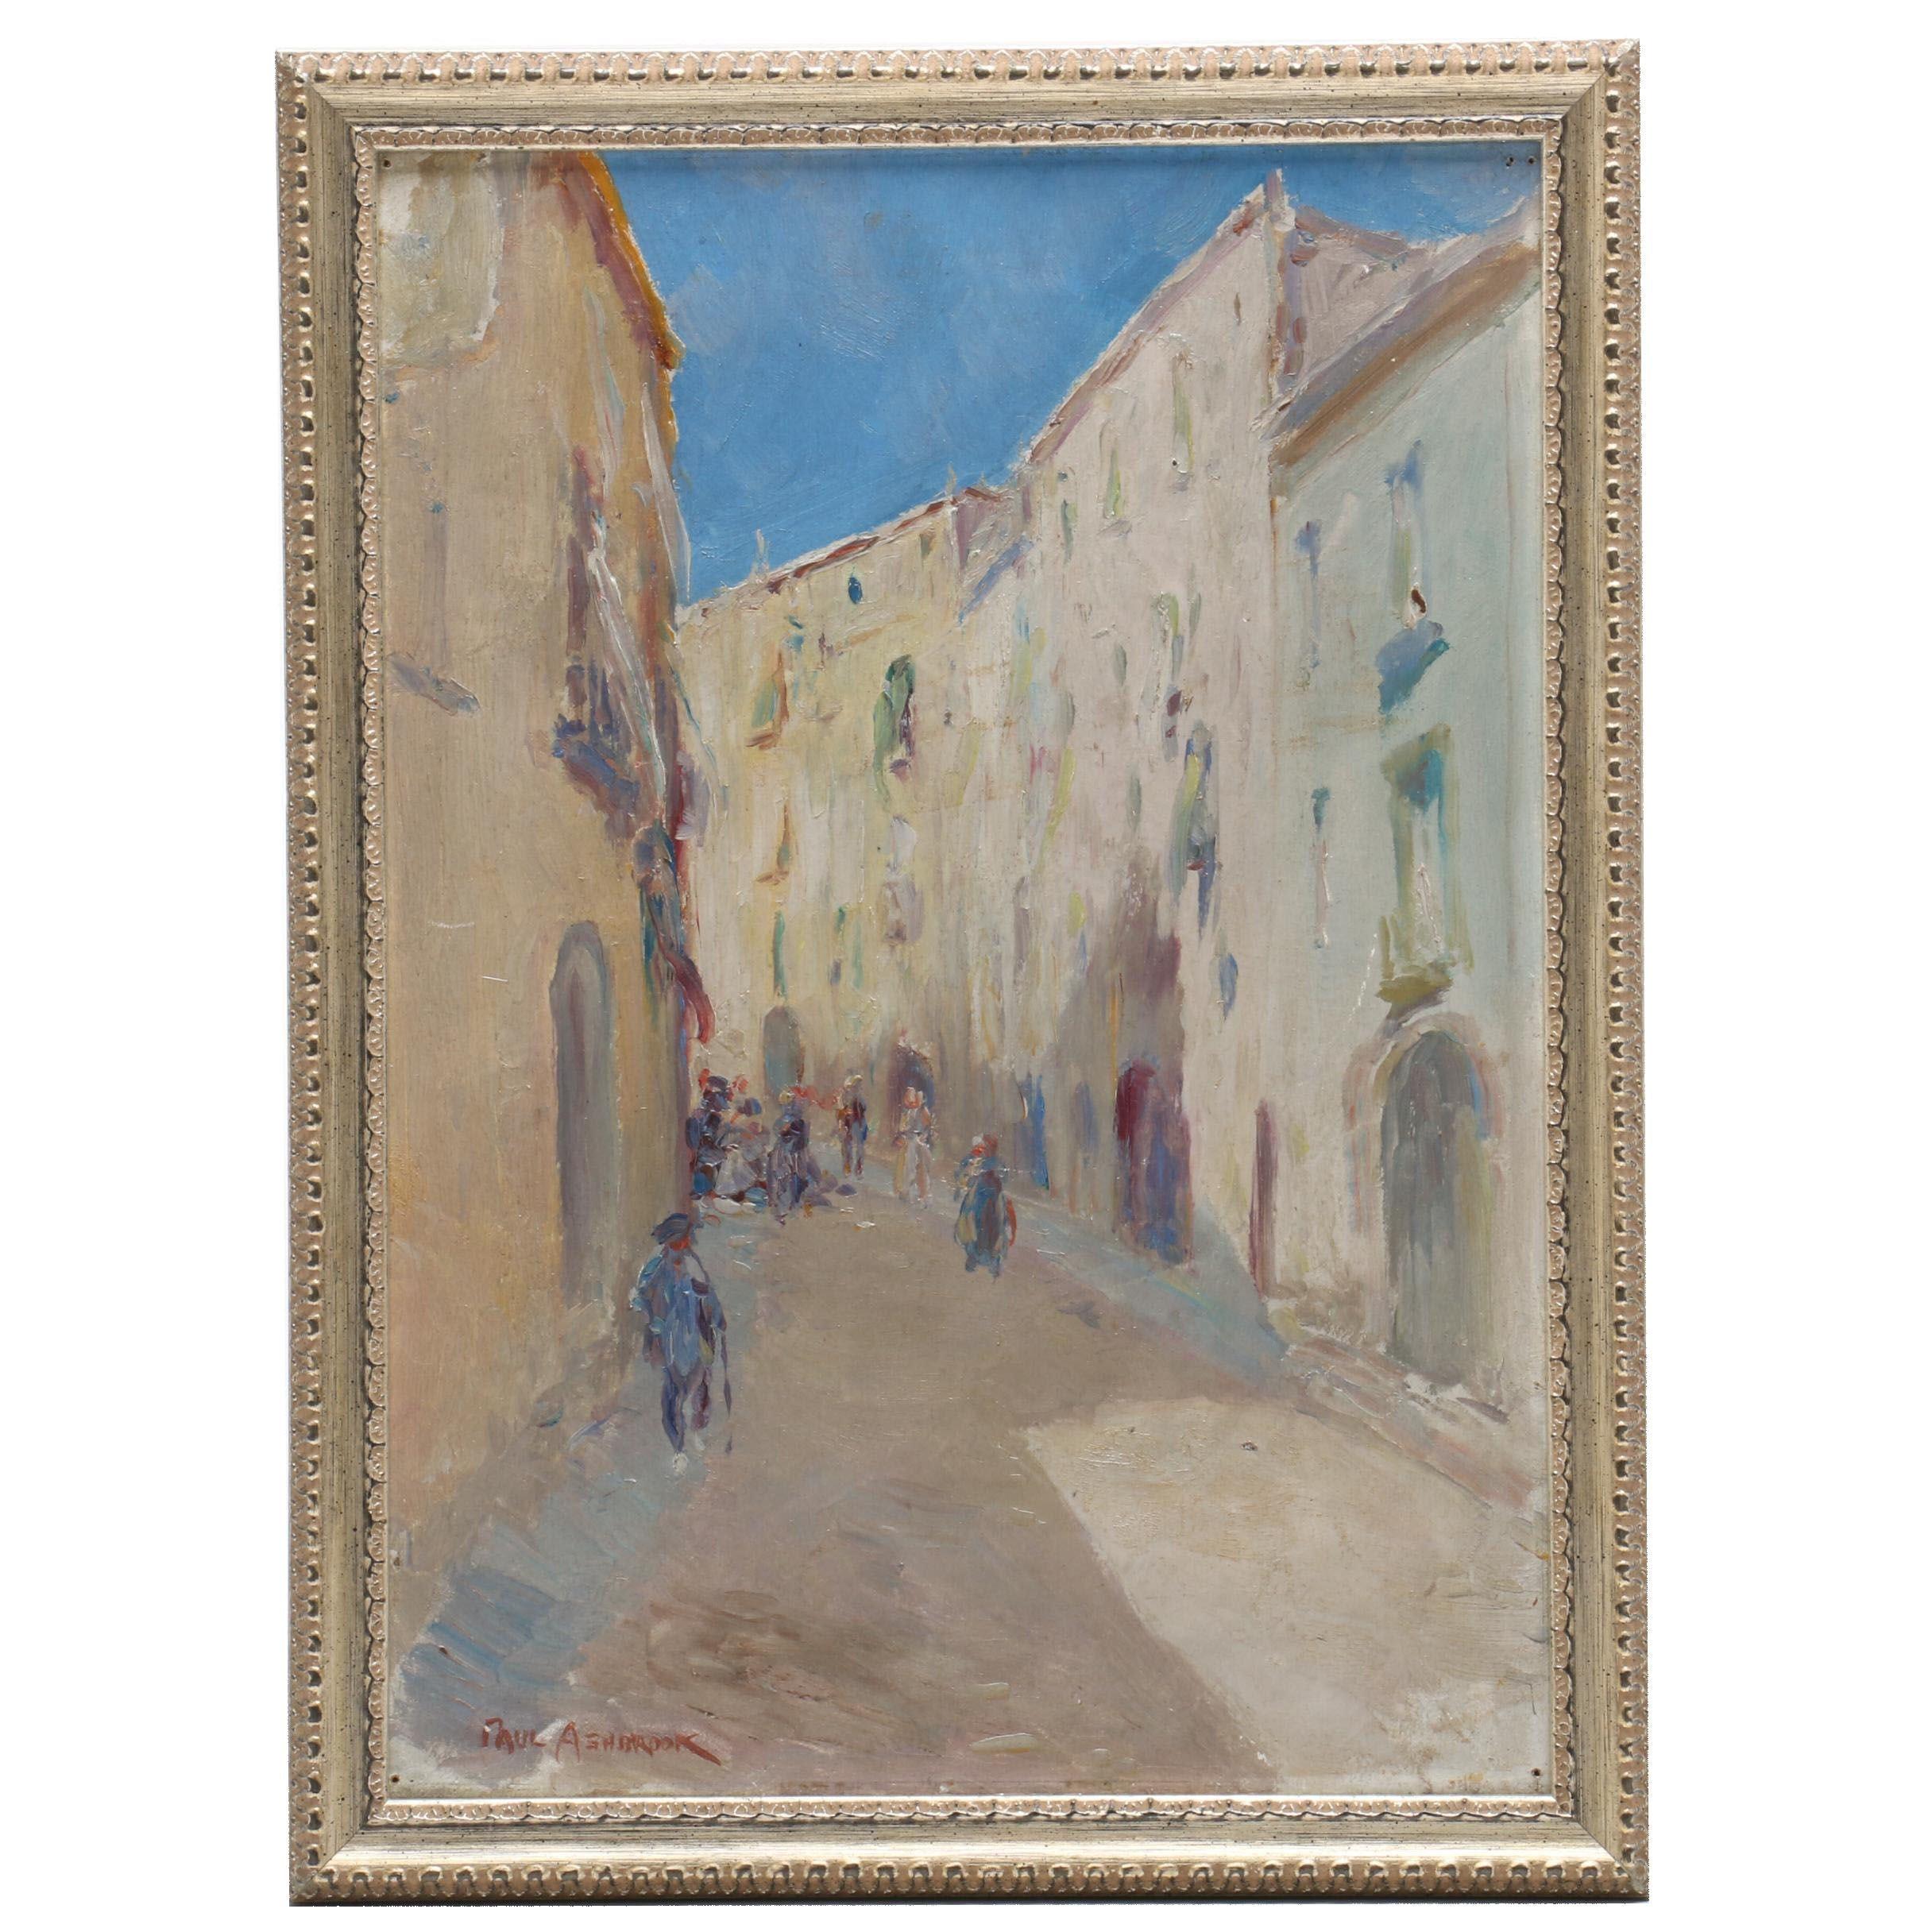 "Paul Ashbrook Oil Painting ""Street Scene Tarragona"""